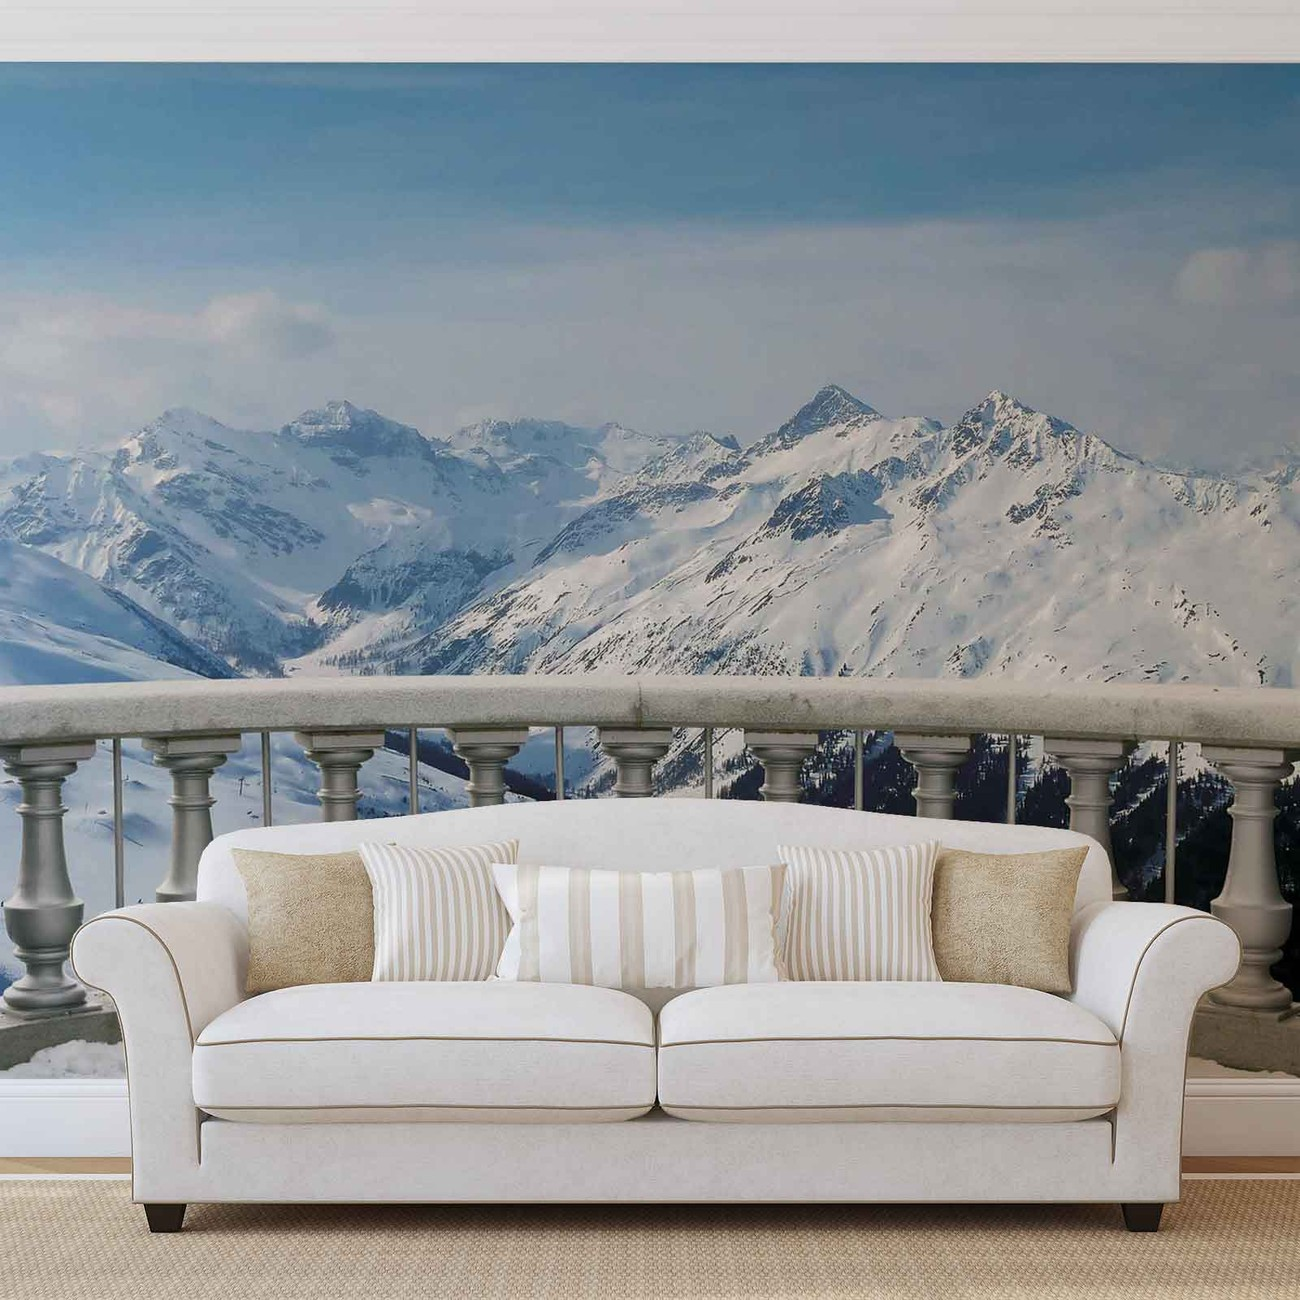 fototapete tapete ausblick landschaft berge schnee bei europosters kostenloser versand. Black Bedroom Furniture Sets. Home Design Ideas